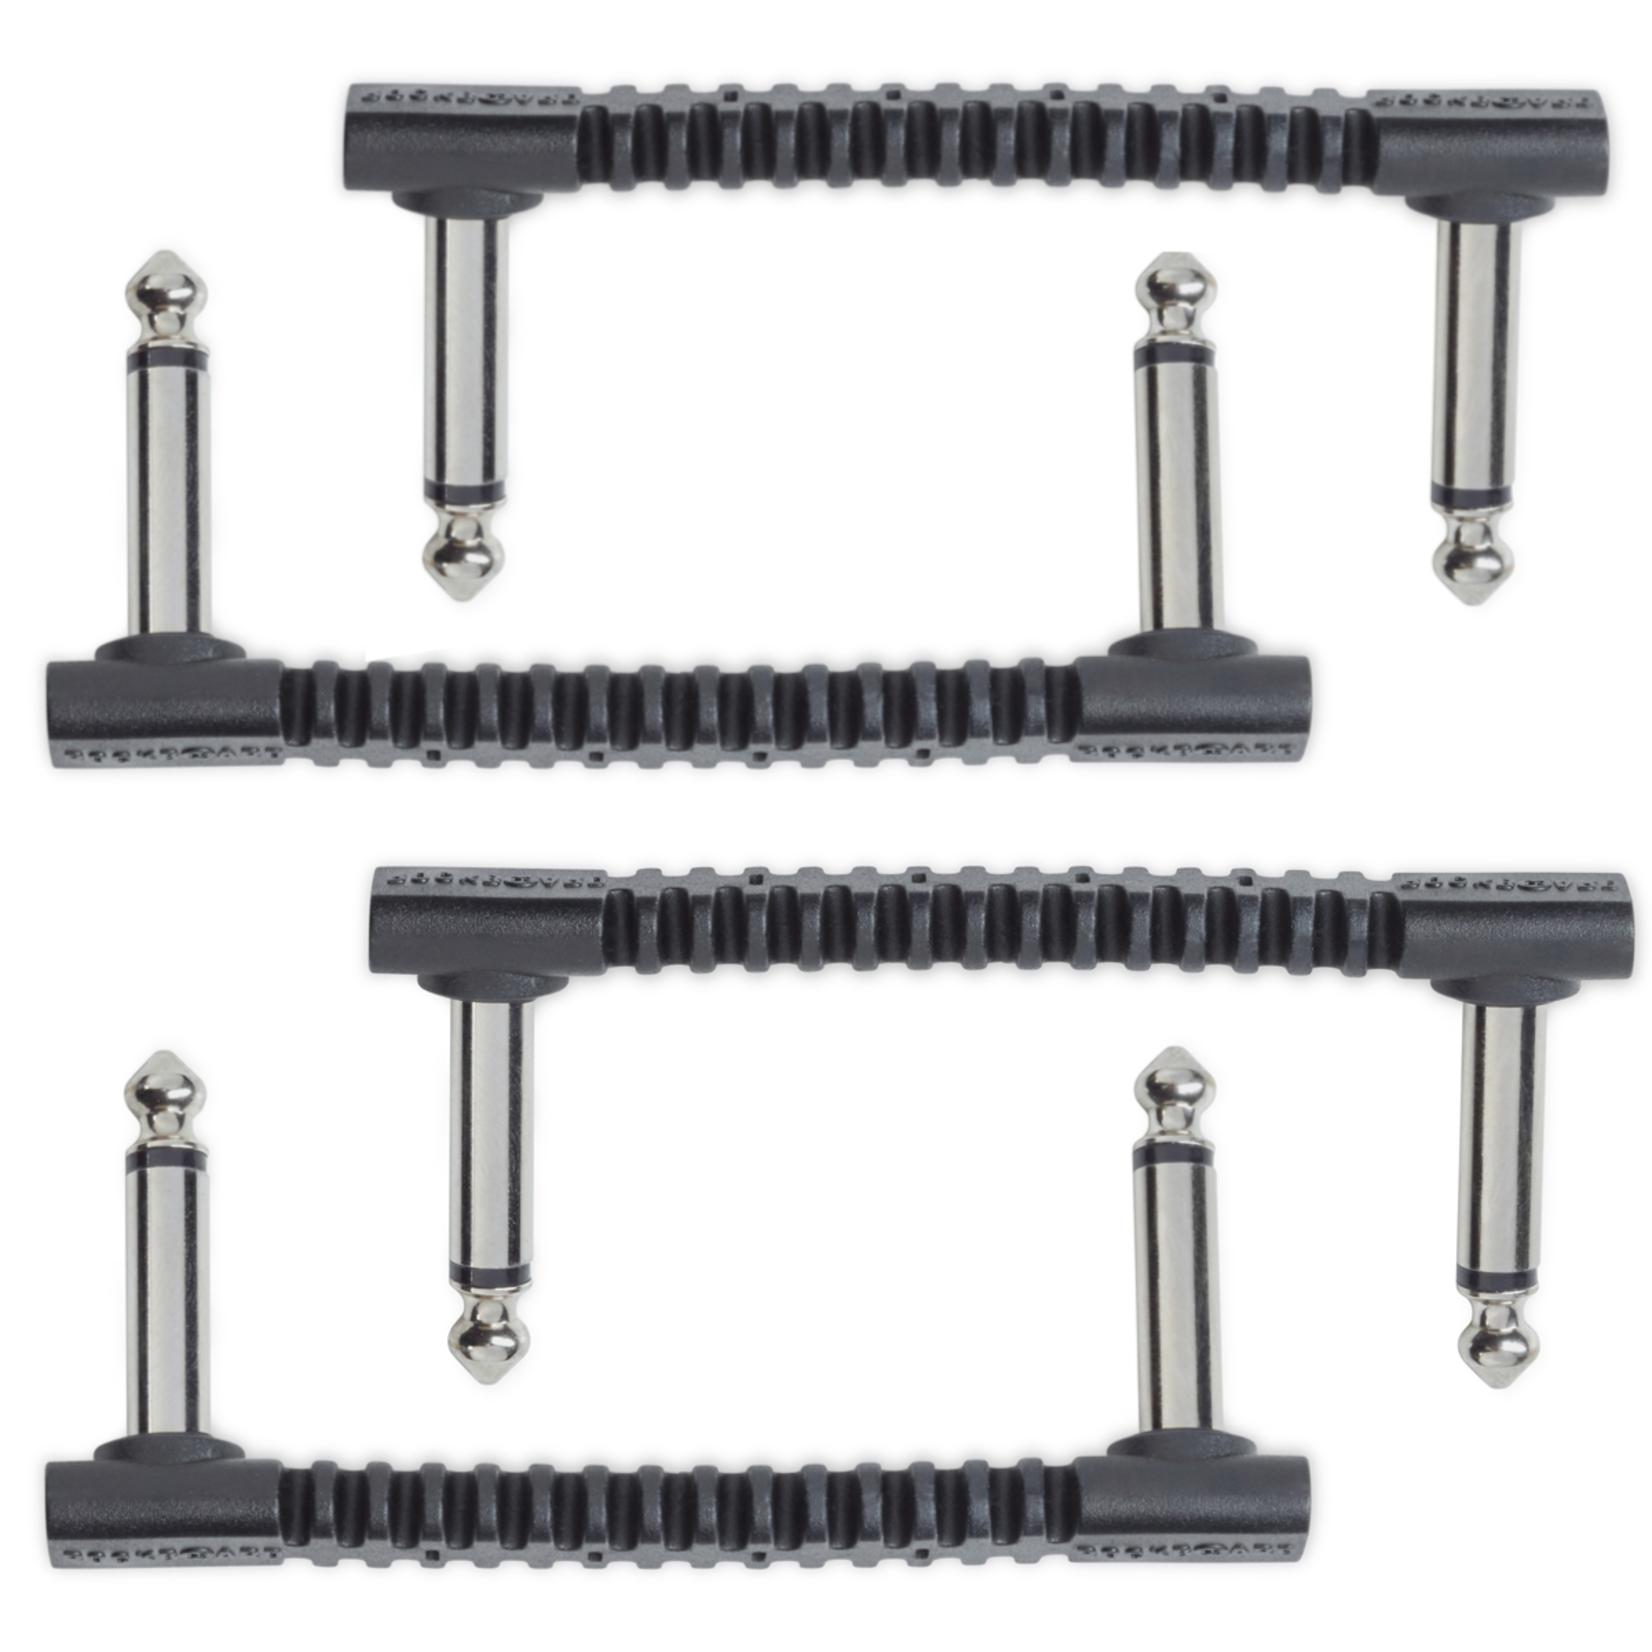 "Rockboard RockBoard 4x (set of four) ""Benders"" Flat Patch Cable Connectors 2.93"", Black"